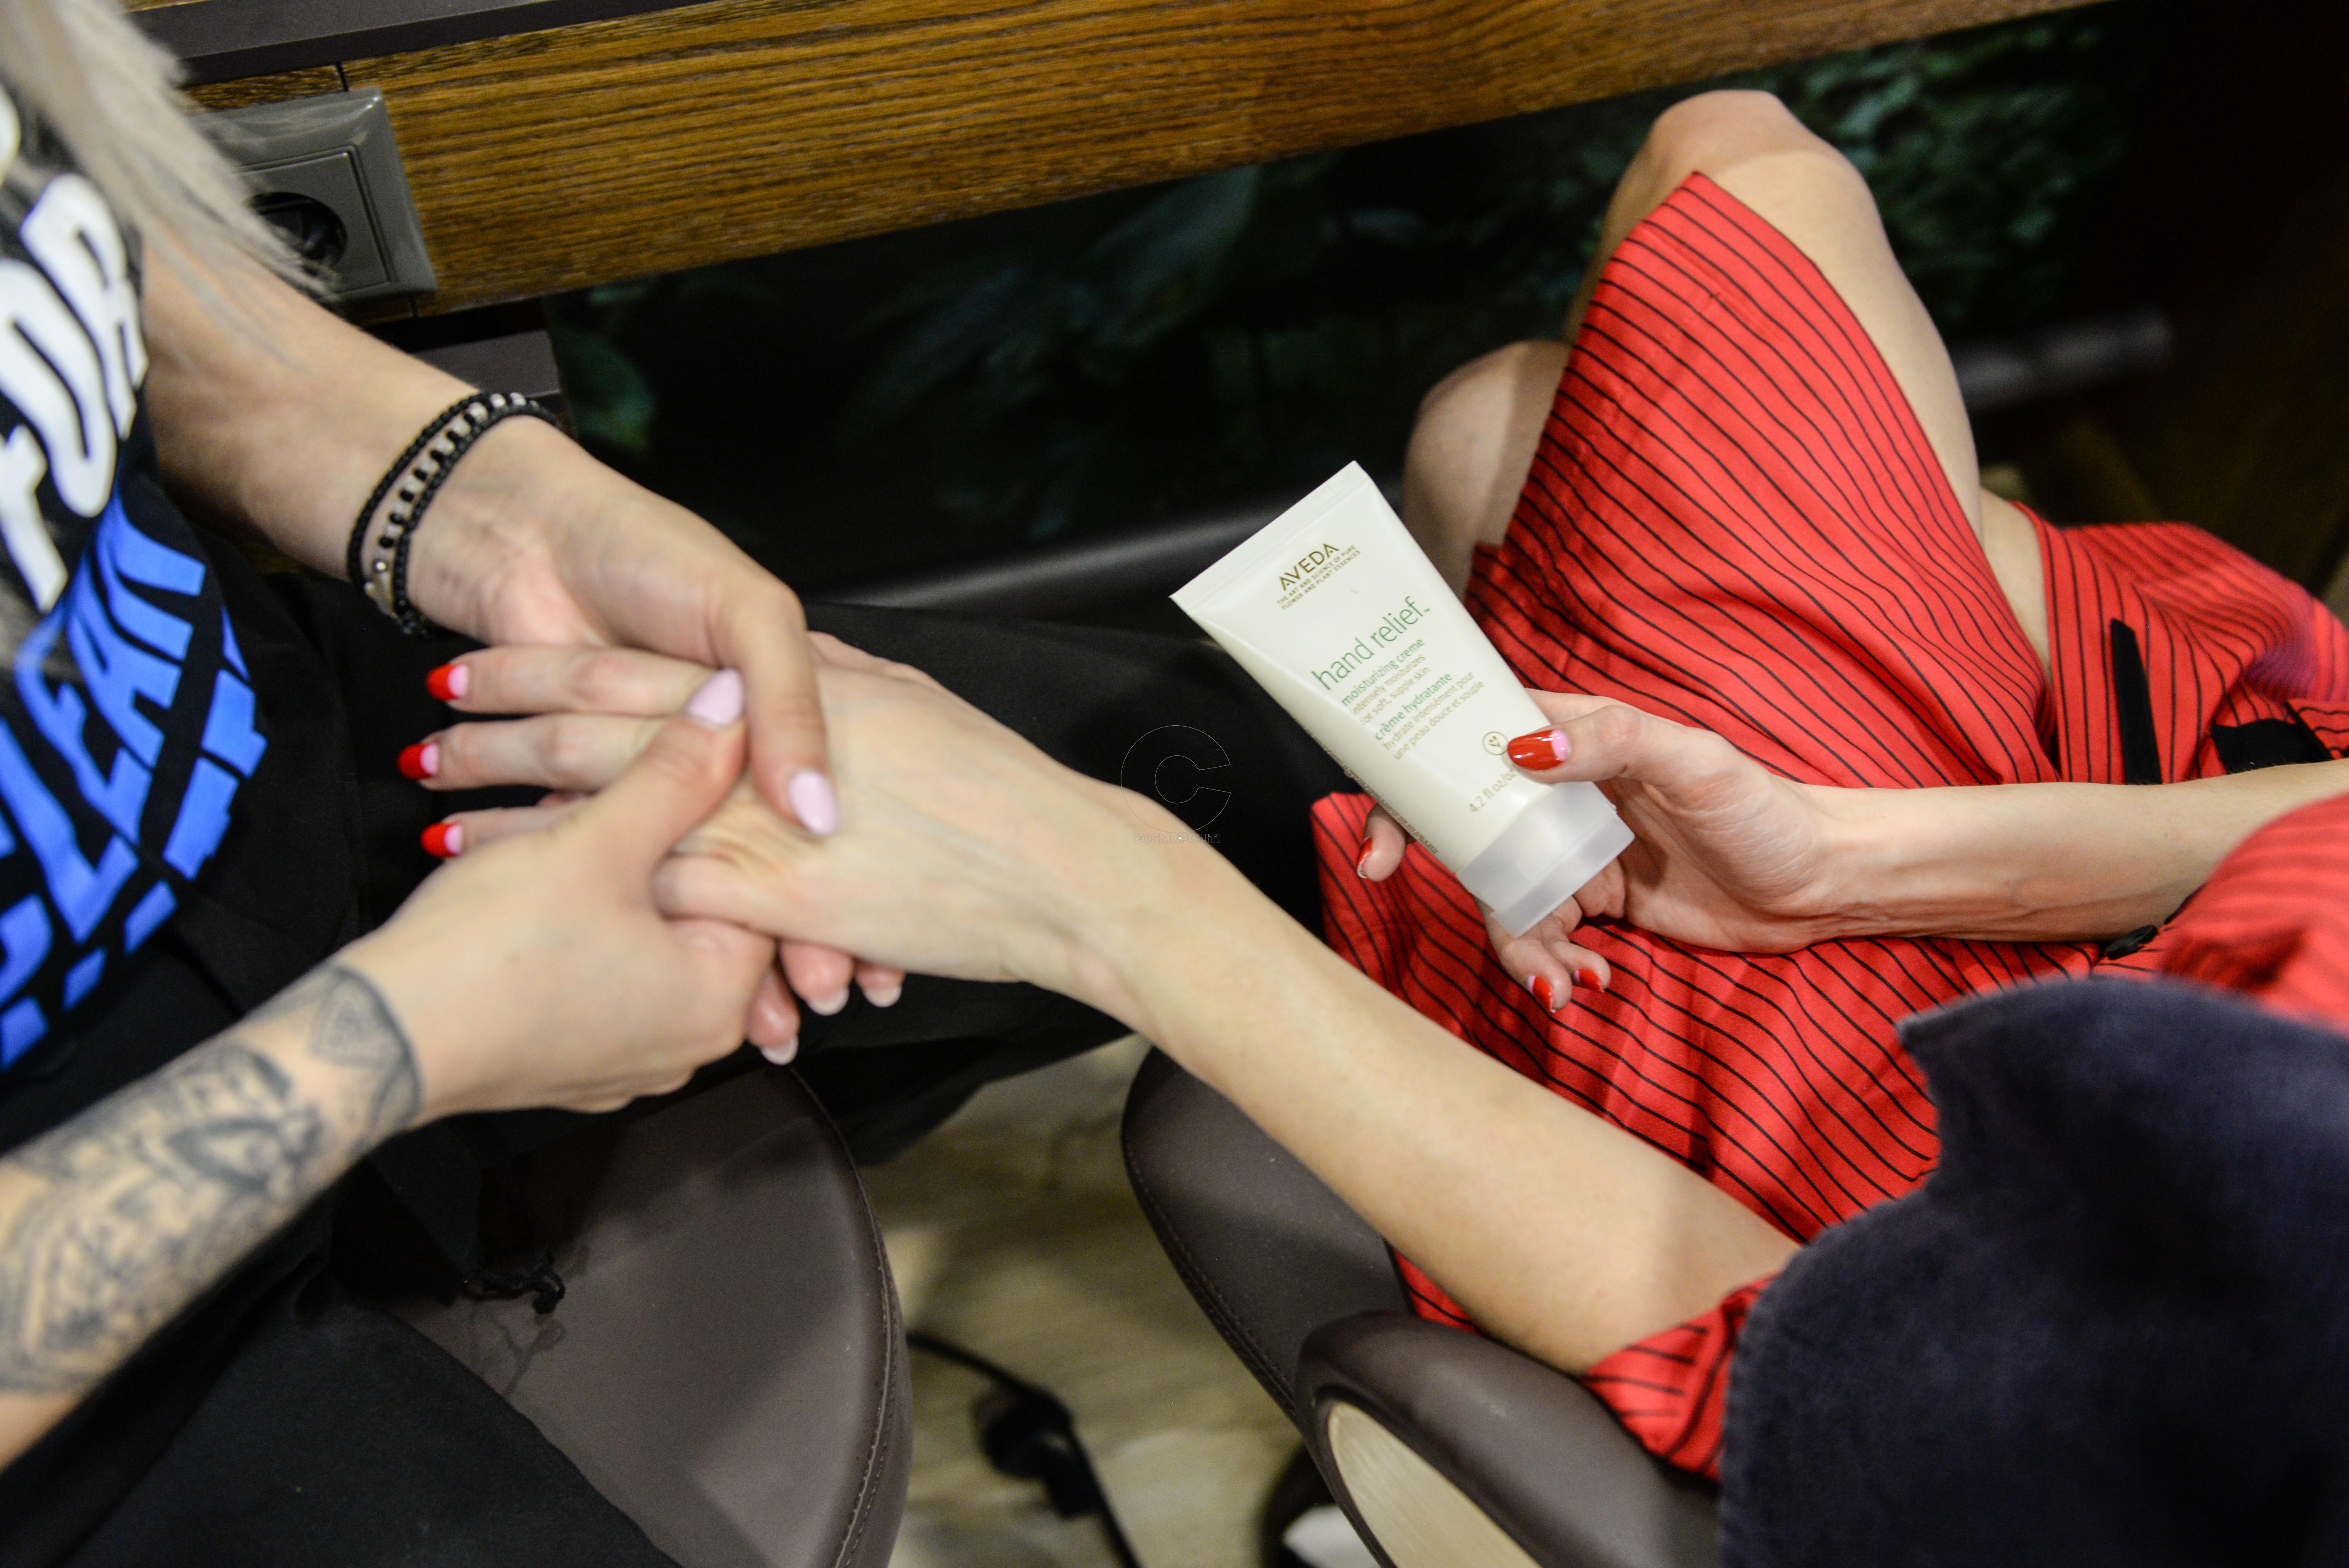 51.KYN_3190 Η διαδικασία του hand massage με την Aveda hand relief moisturizing cream